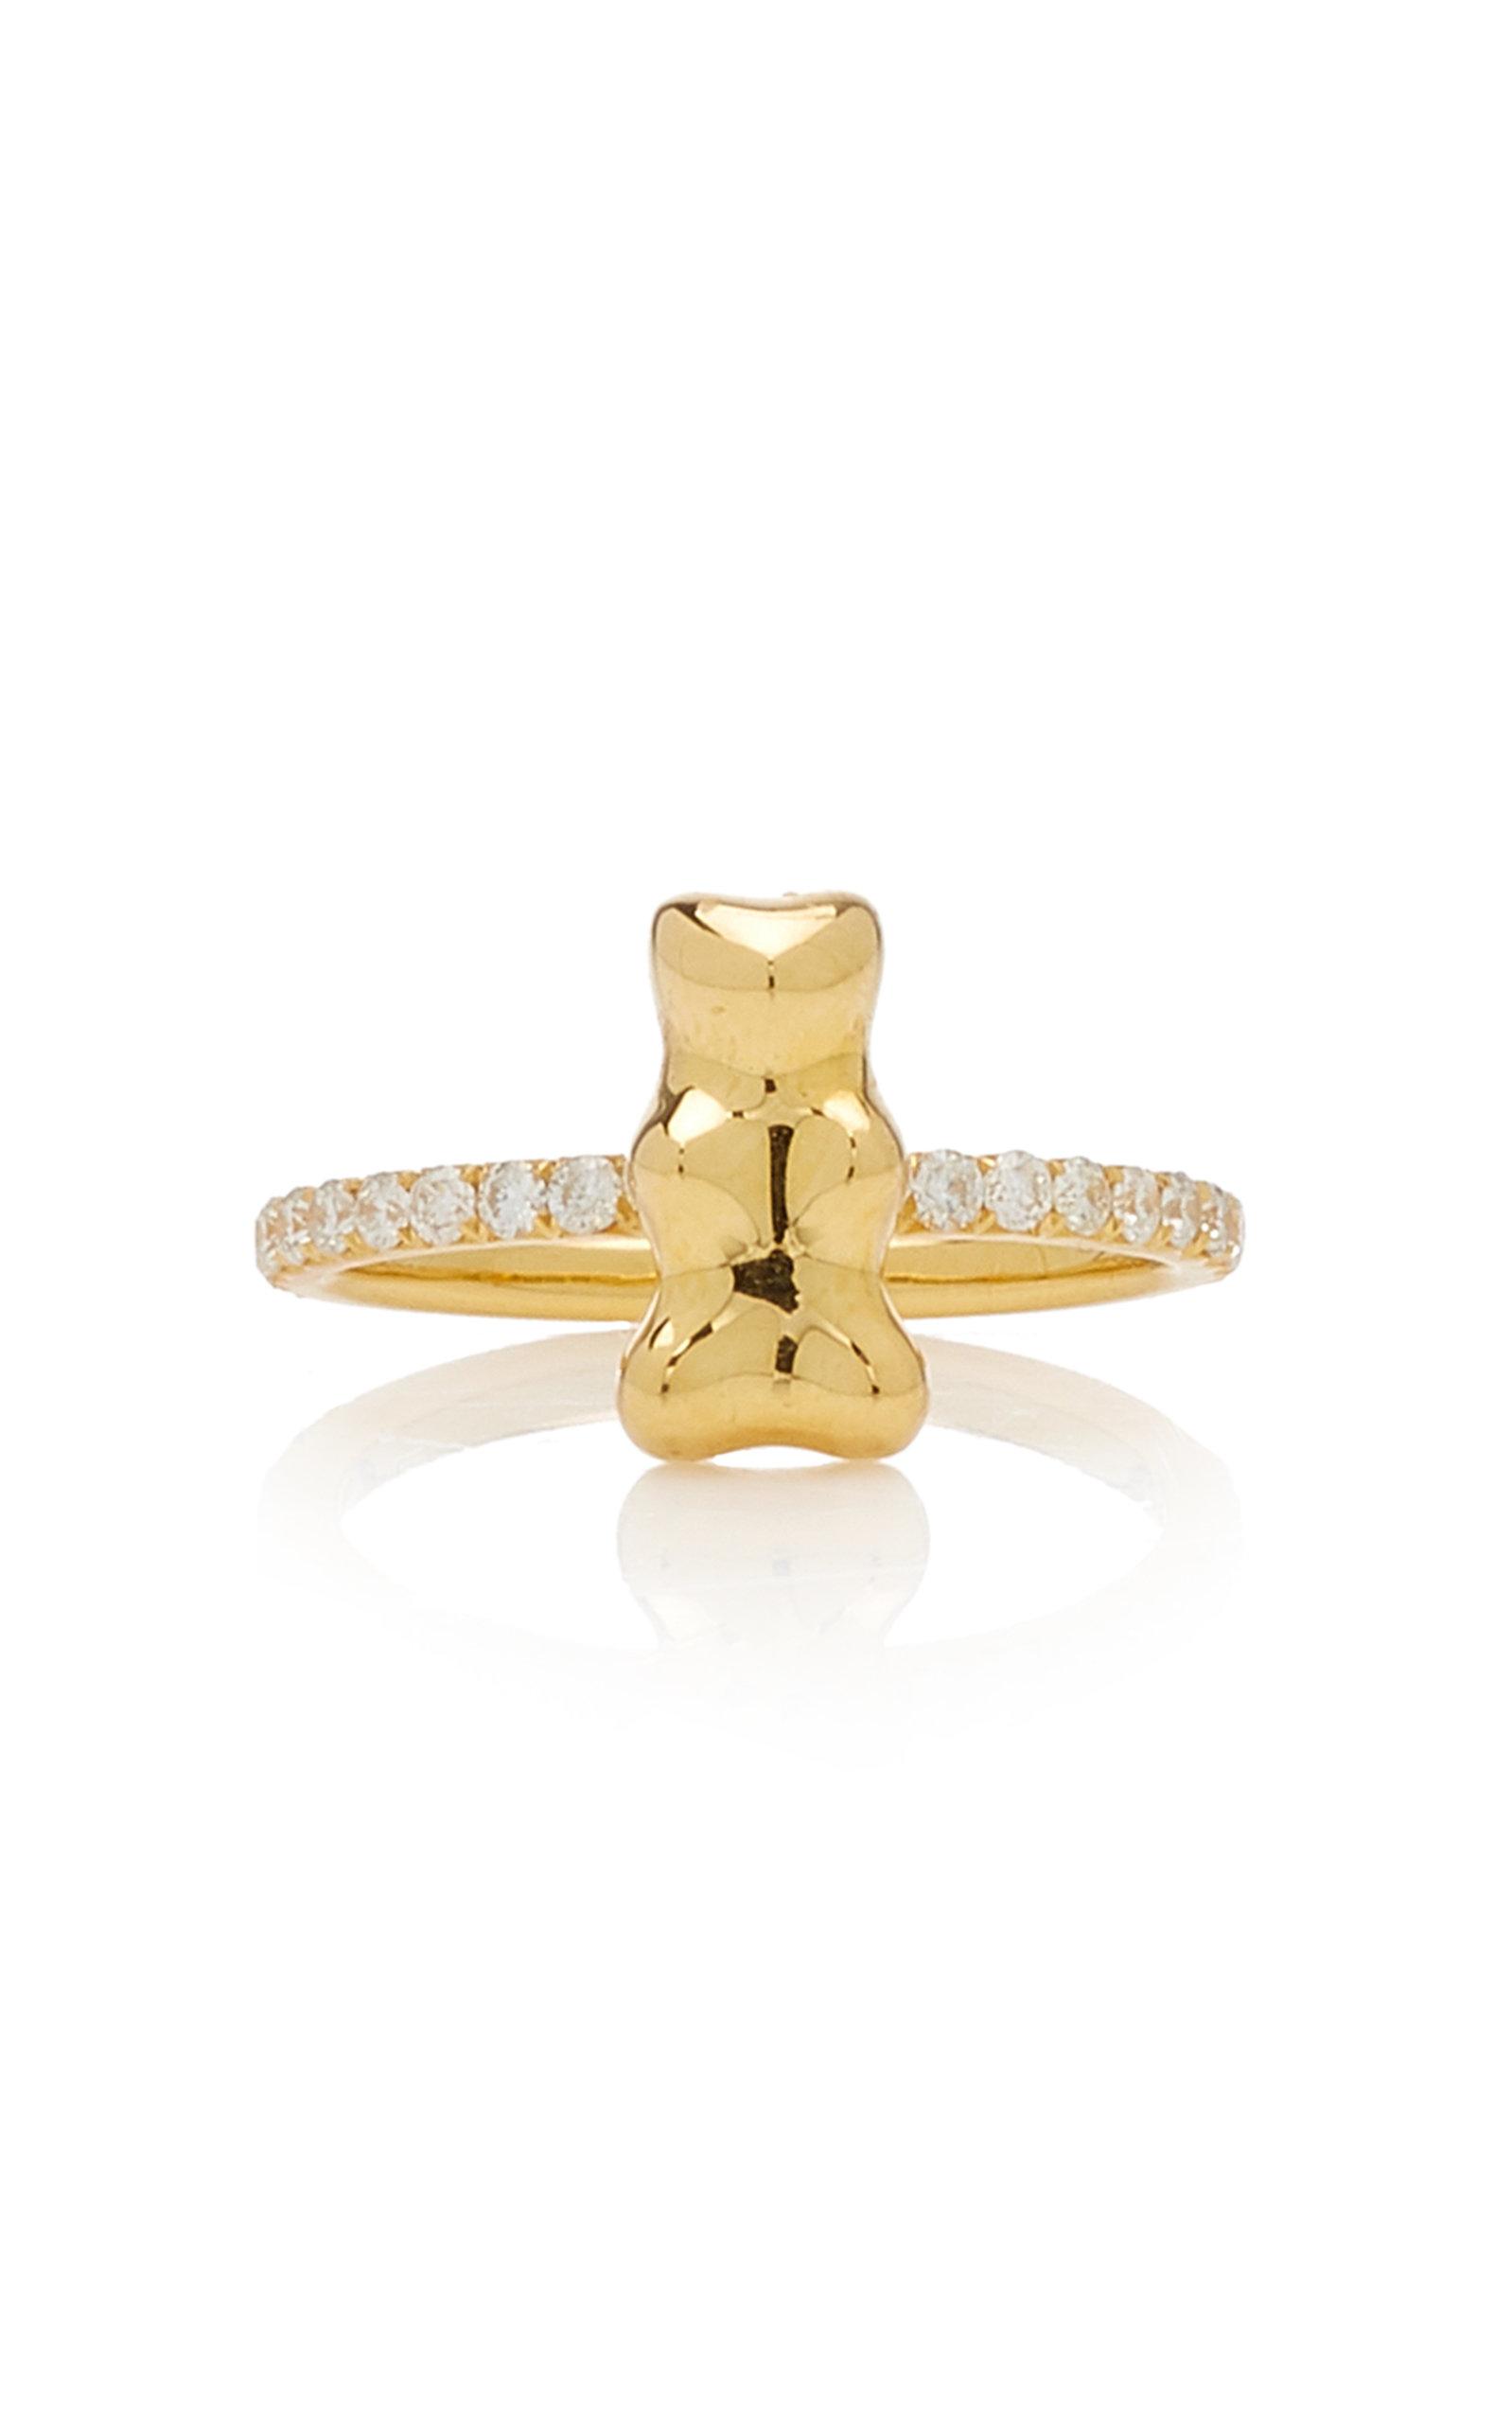 Lauren X Khoo - Women's Gummy Bear 18K Yellow Gold Diamond Ring - Gold - Moda Operandi